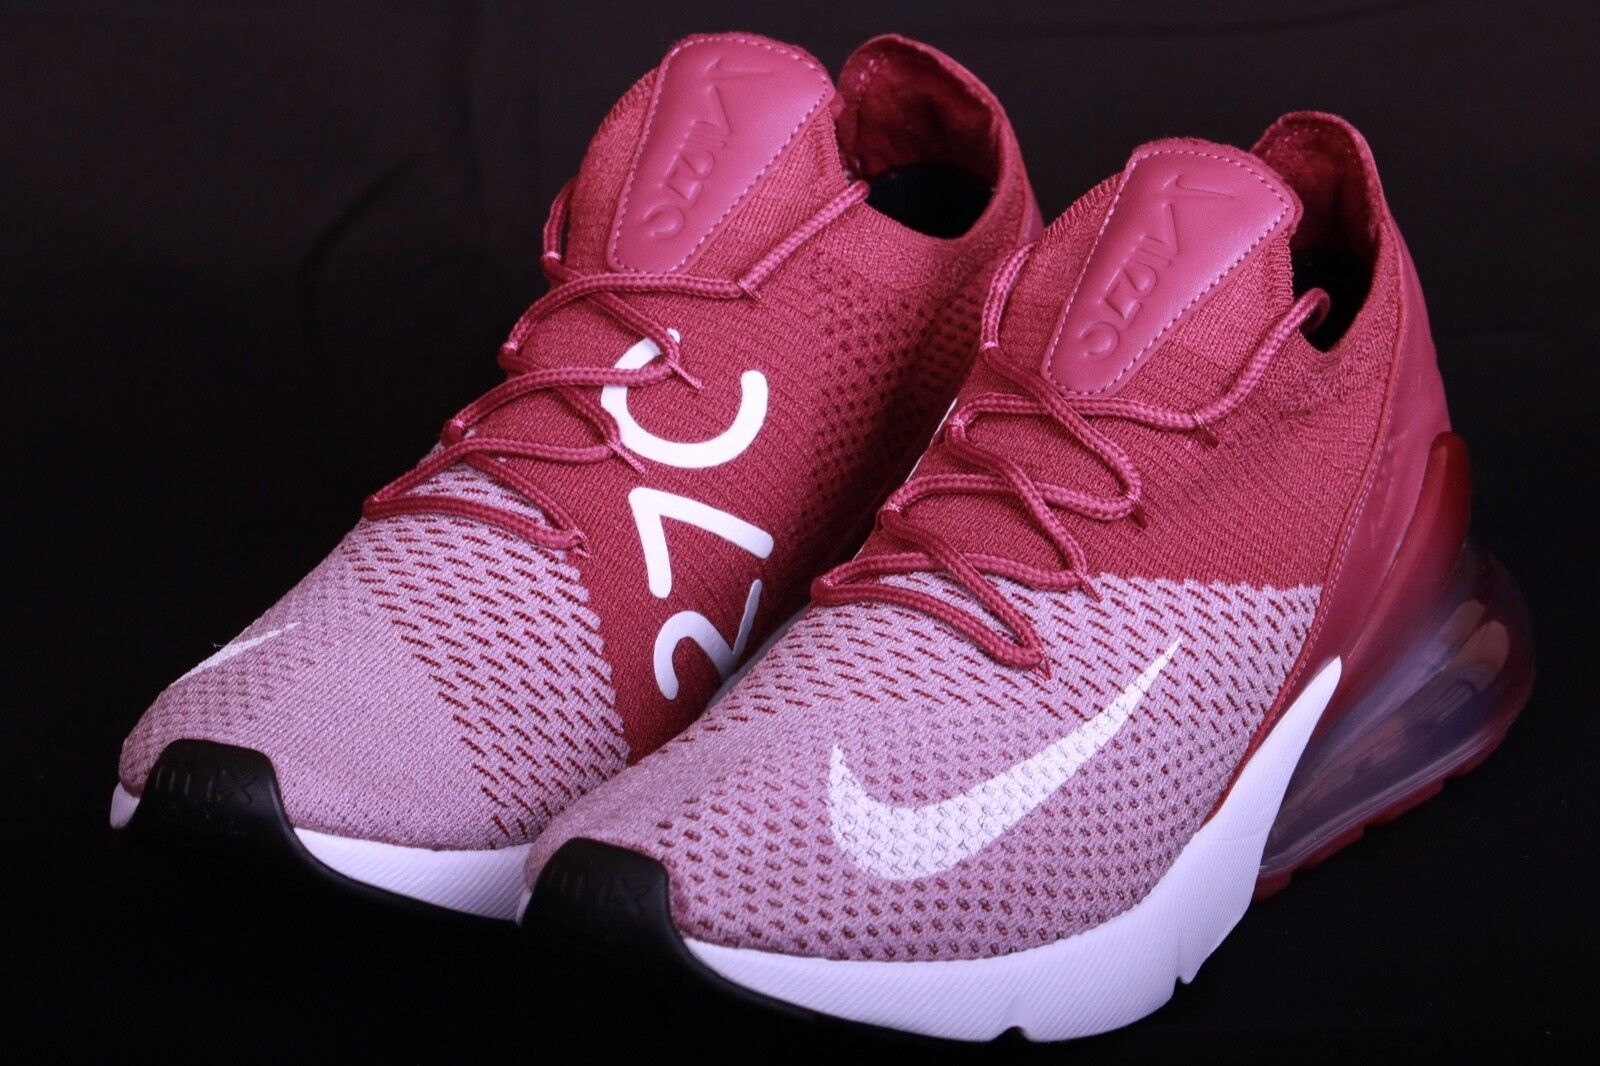 Nike Air Max 1 Satin Pack Red AO1021 600